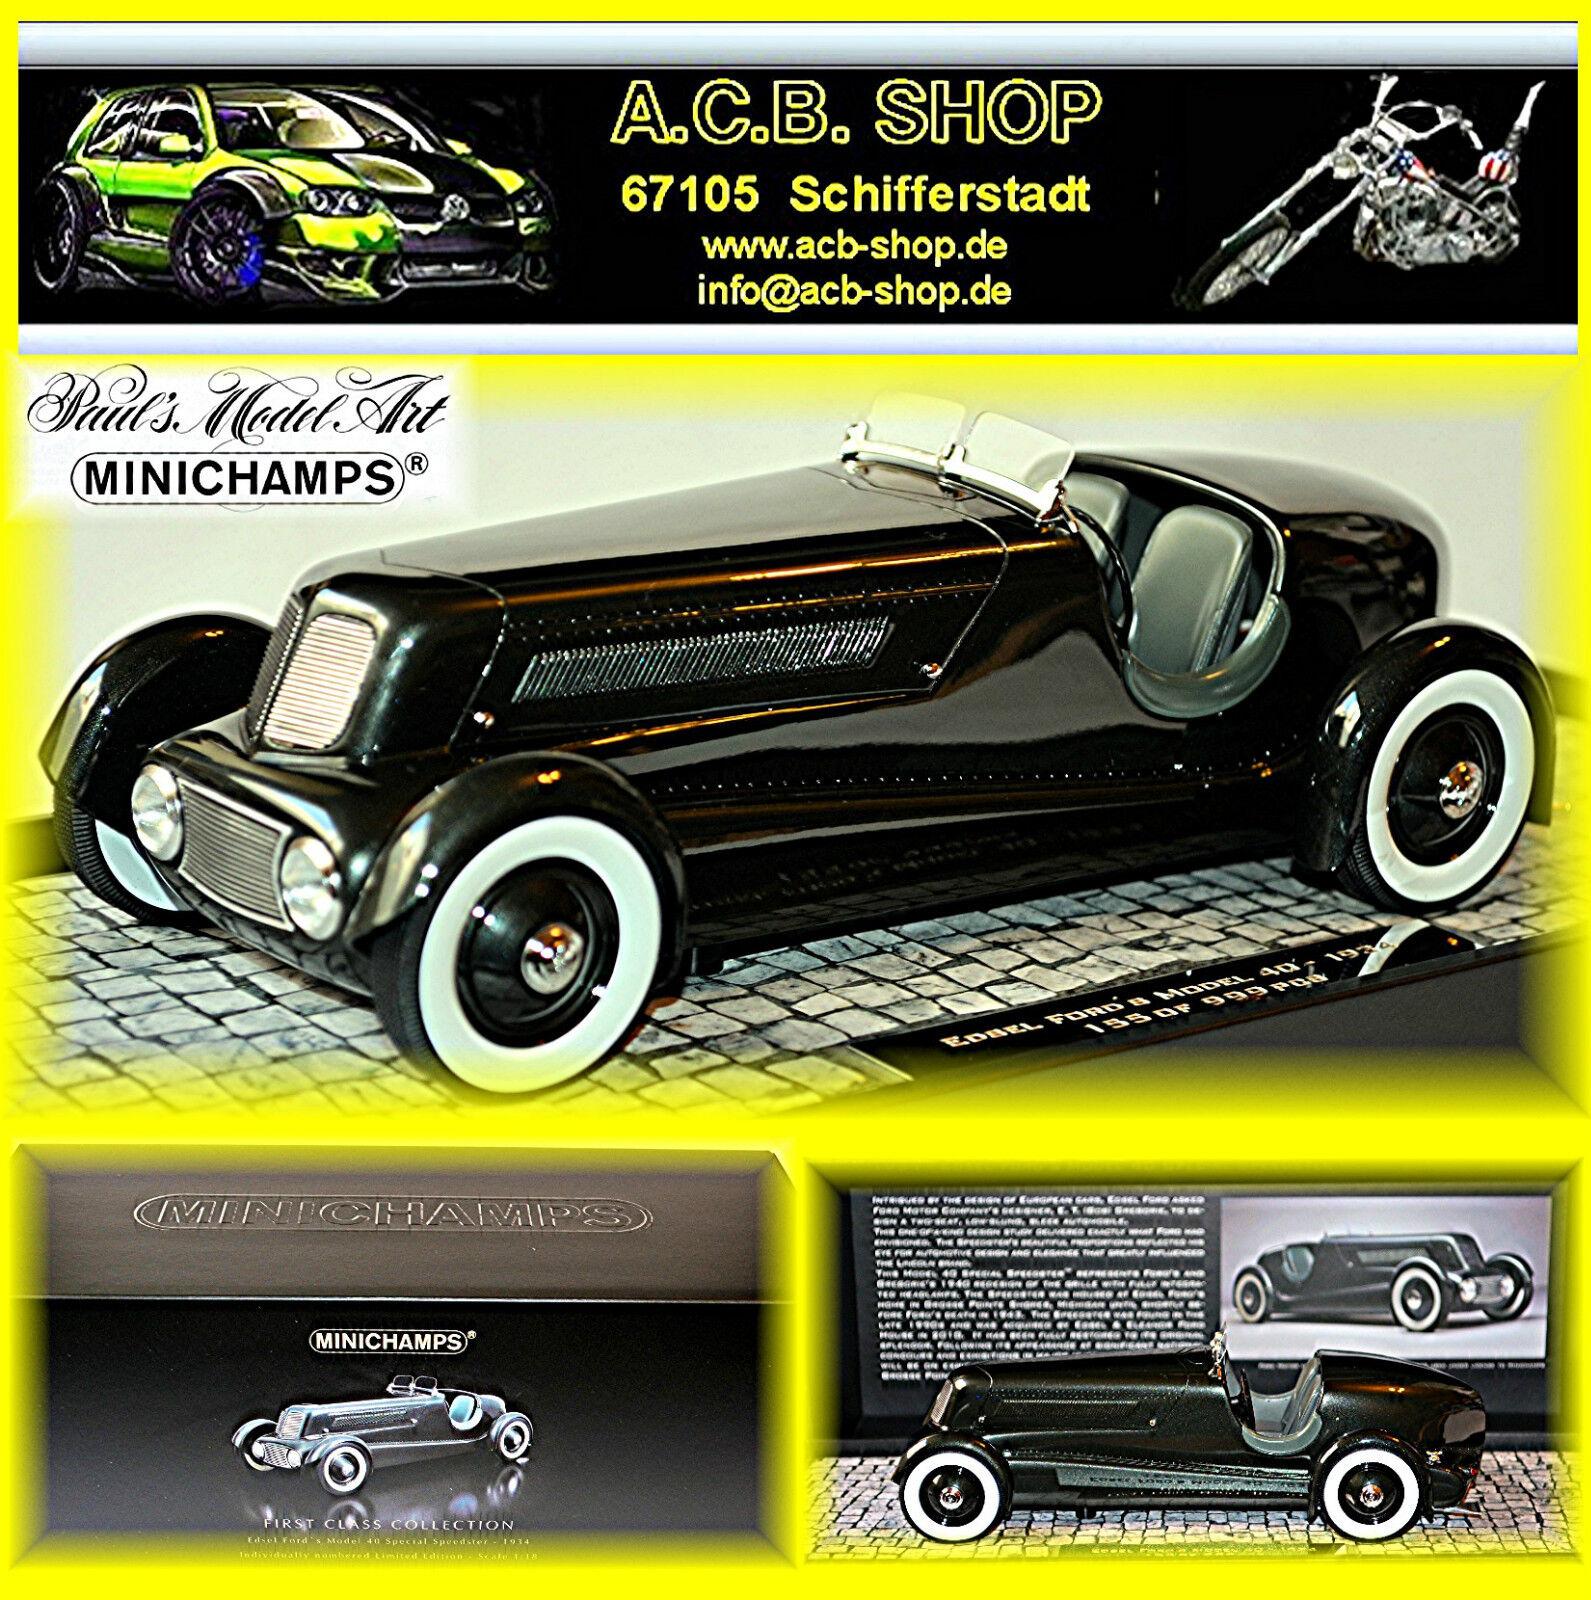 a la venta Edsel Ford Model 40 Special Speedster 1934 Pearl Pearl Pearl Essence Gun metalizado 1 18  Web oficial